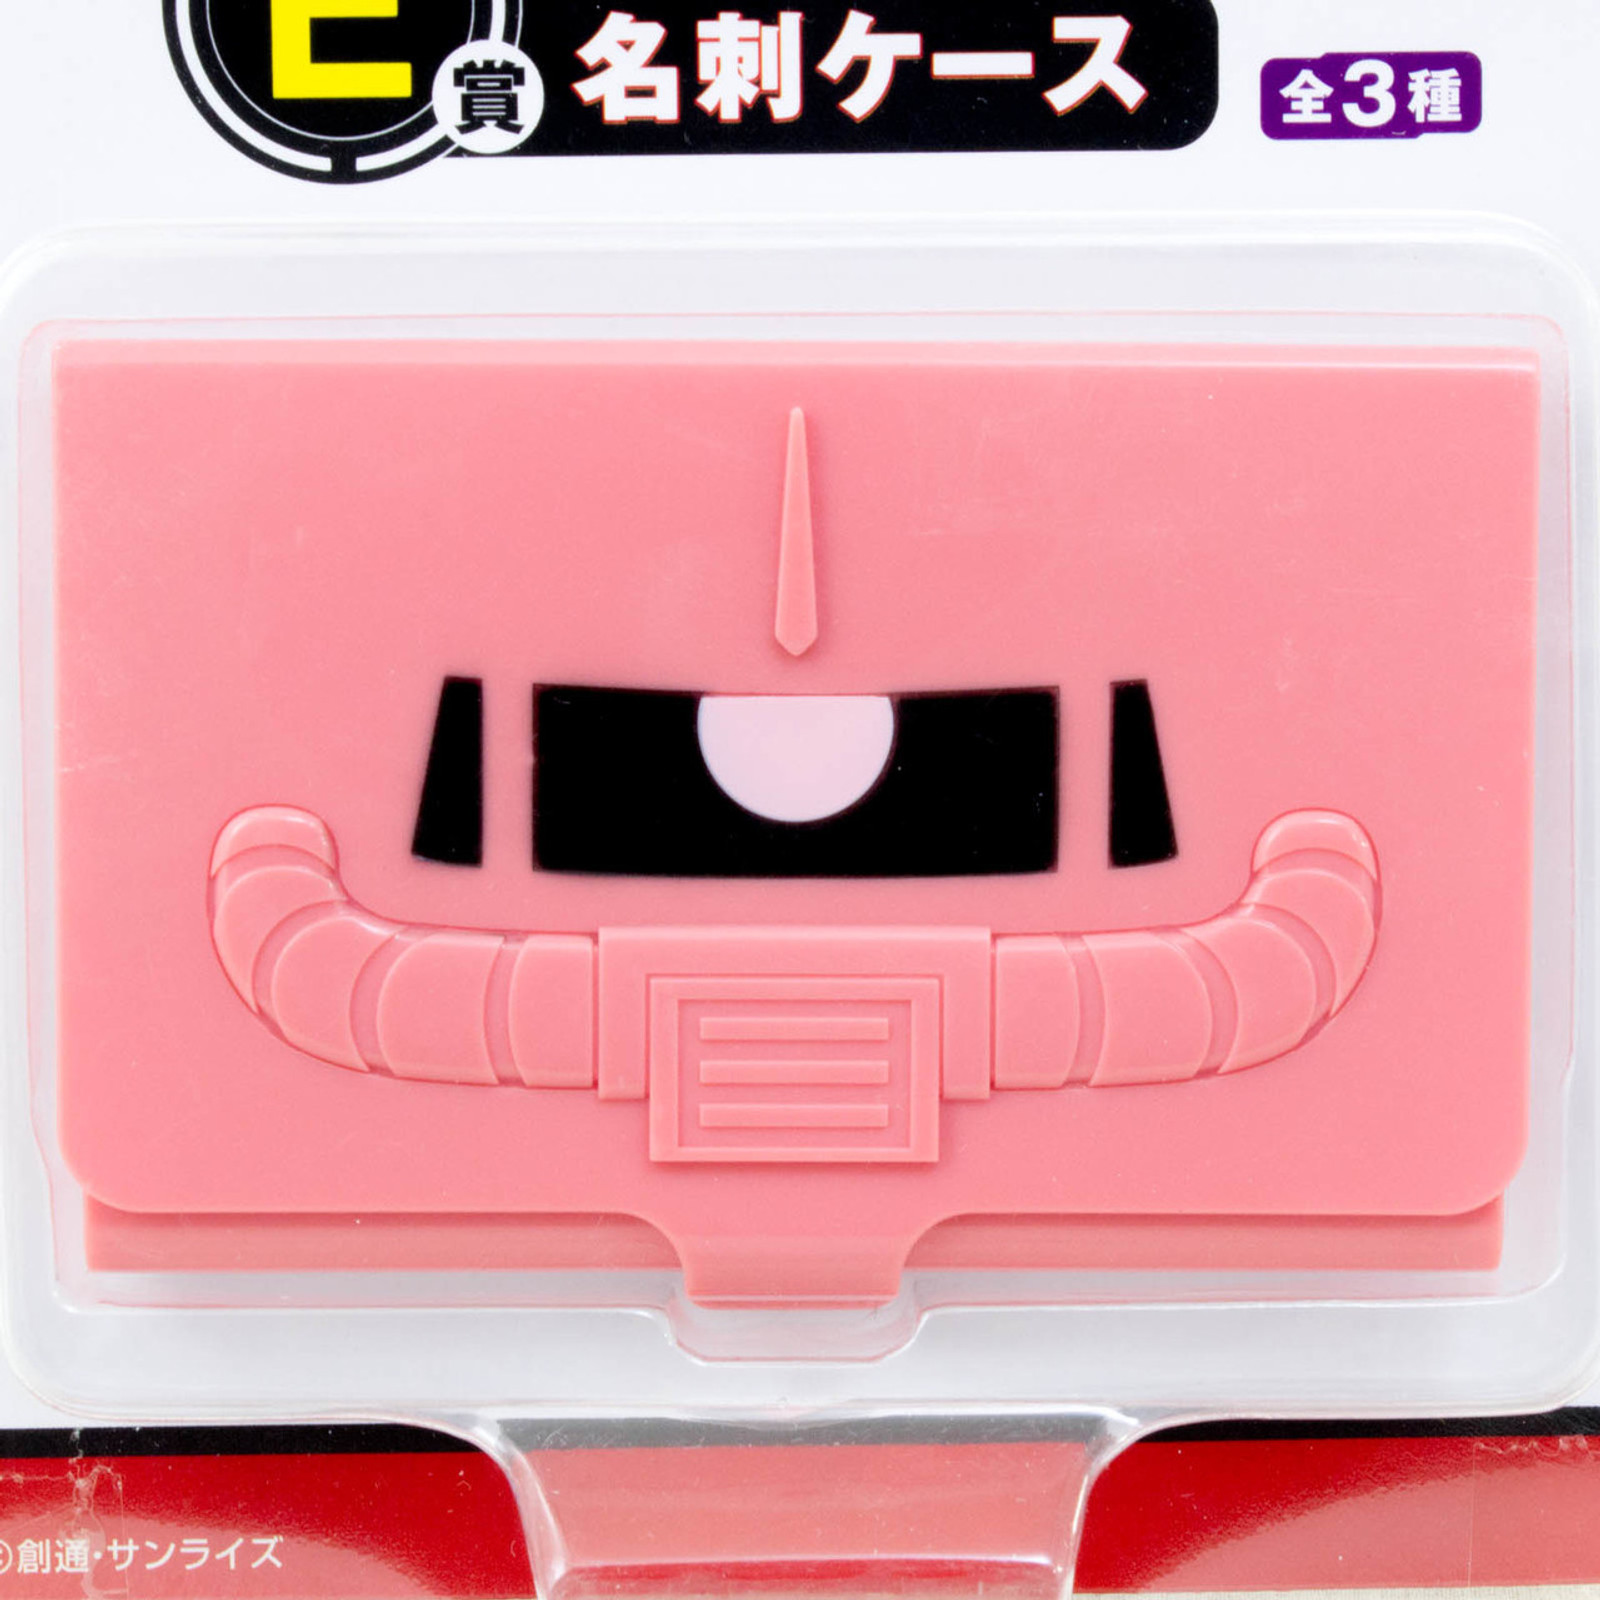 Gundam Buisness Card Case Char Zaku Banpresto JAPAN ANIME MANGA